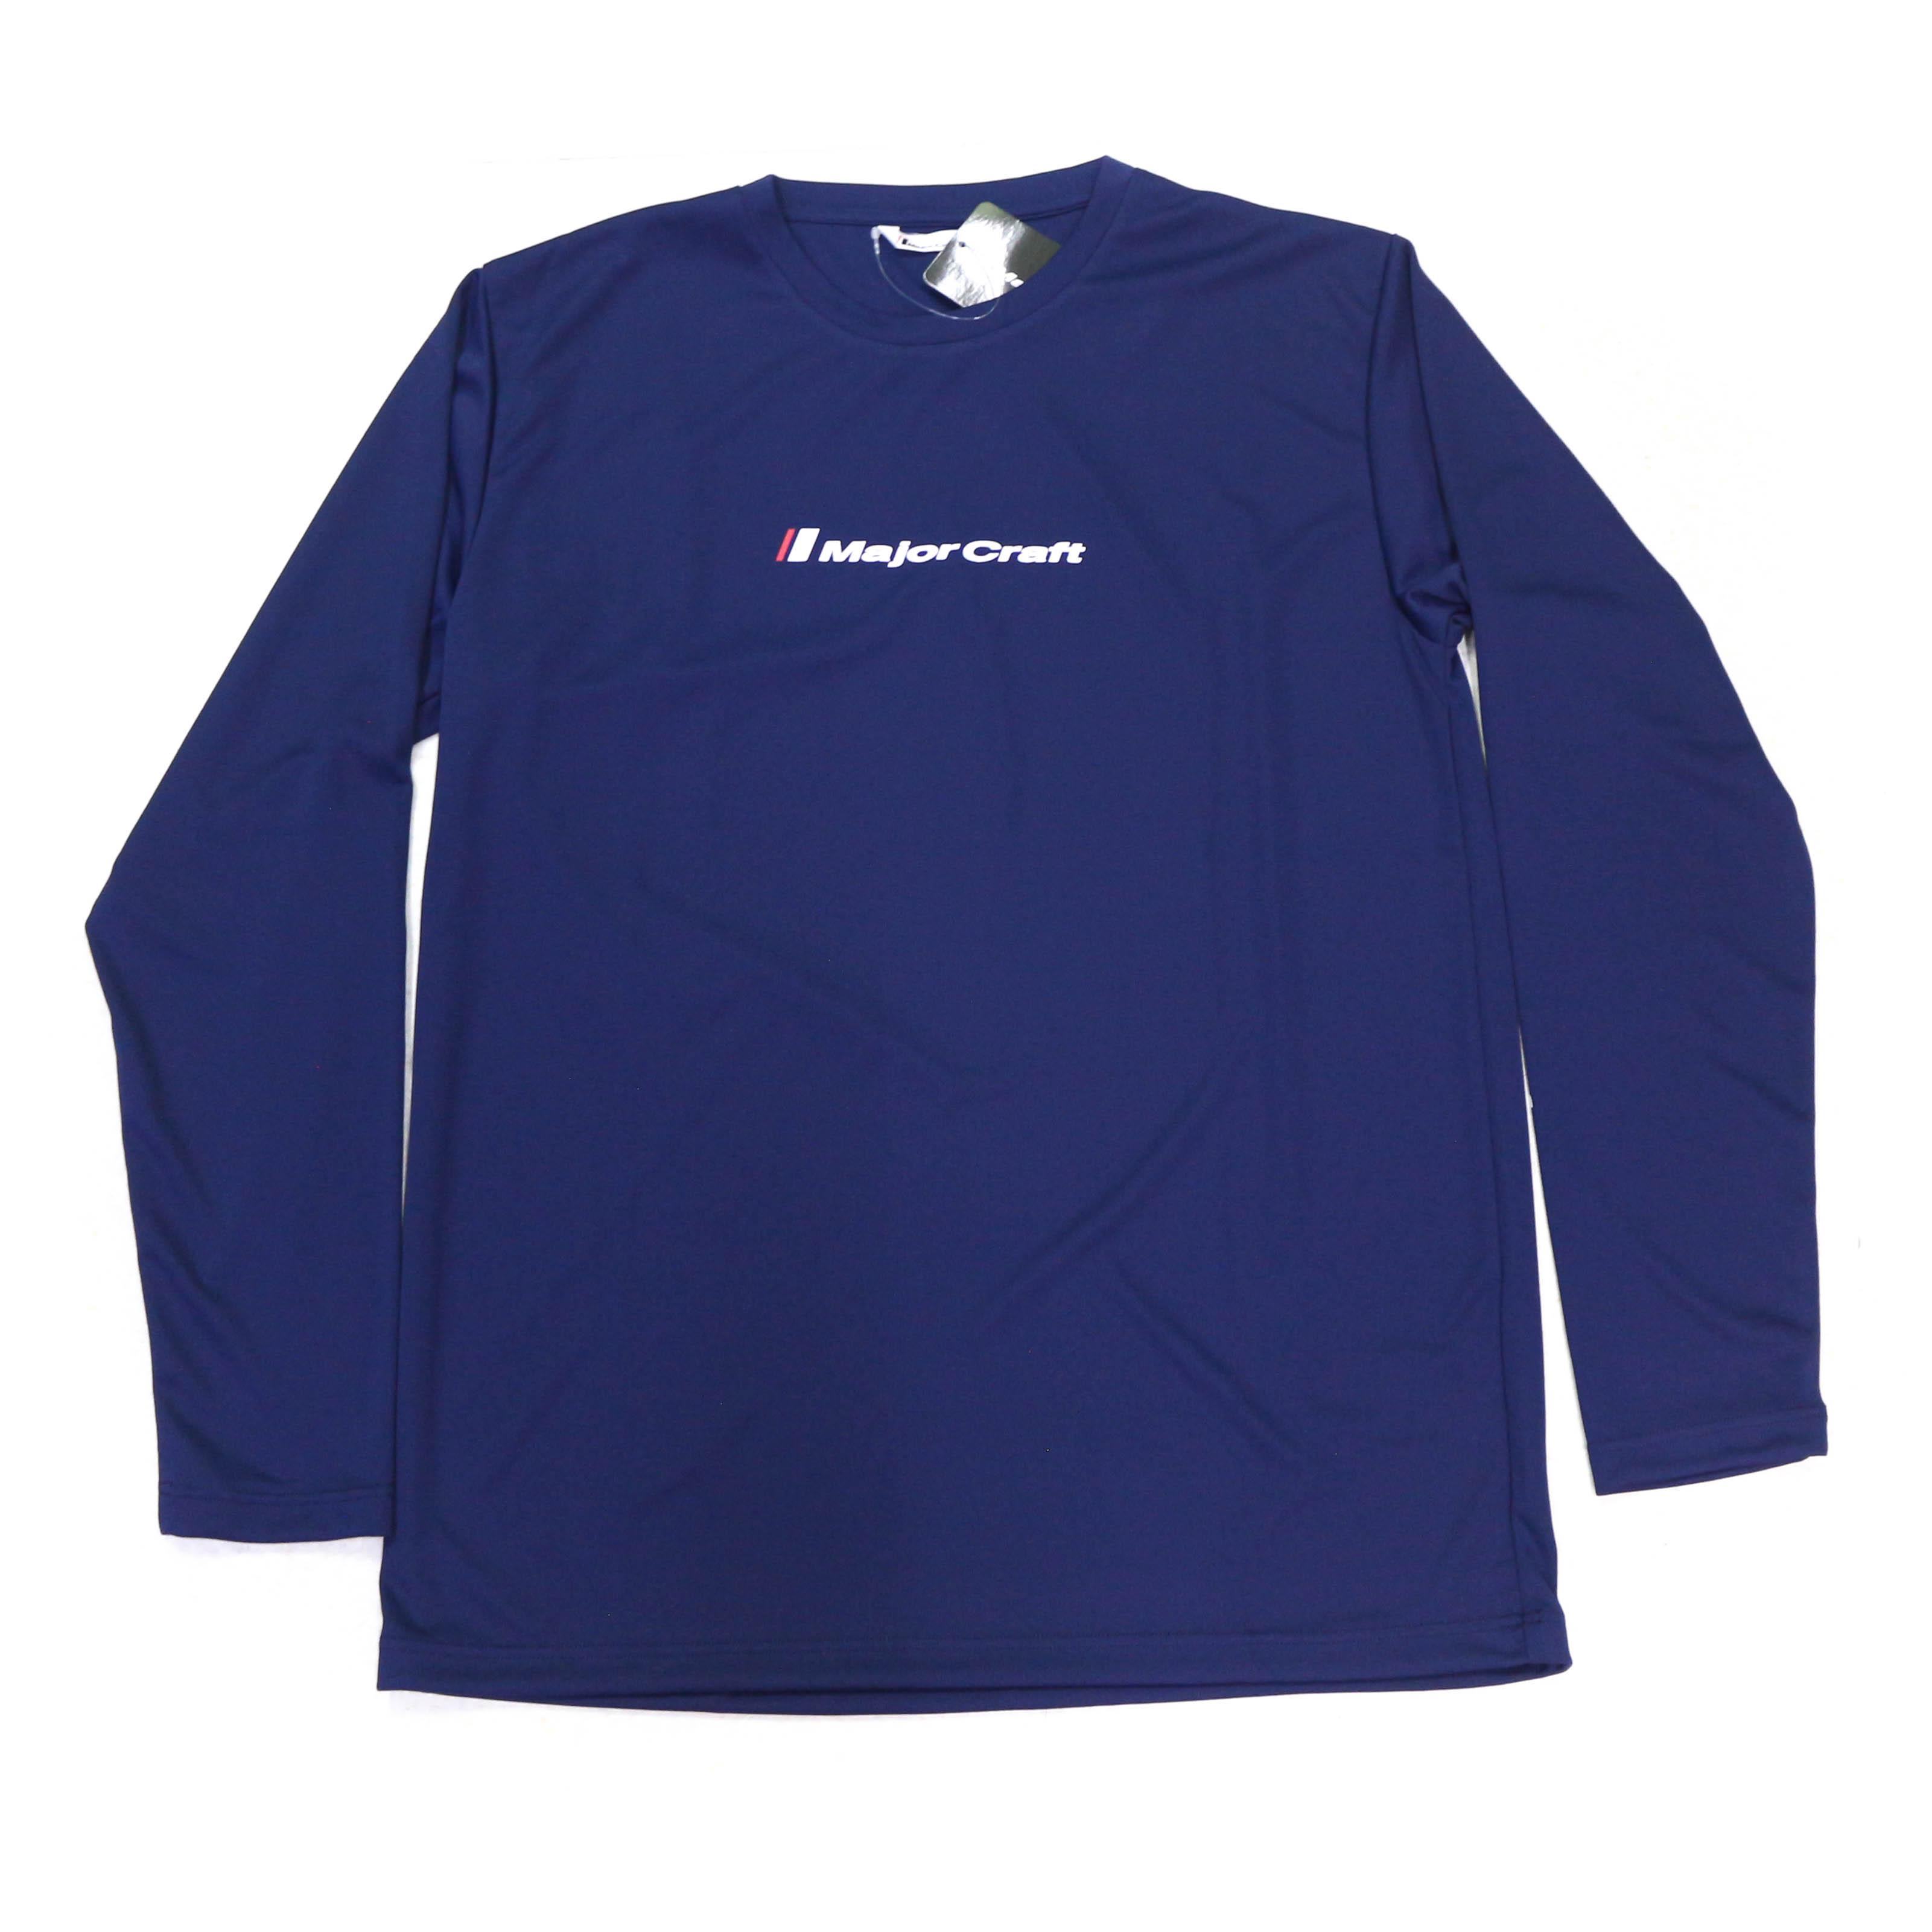 Major Craft T-Shirt Long Sleeve MCW-DLT-4L/NV (3222)